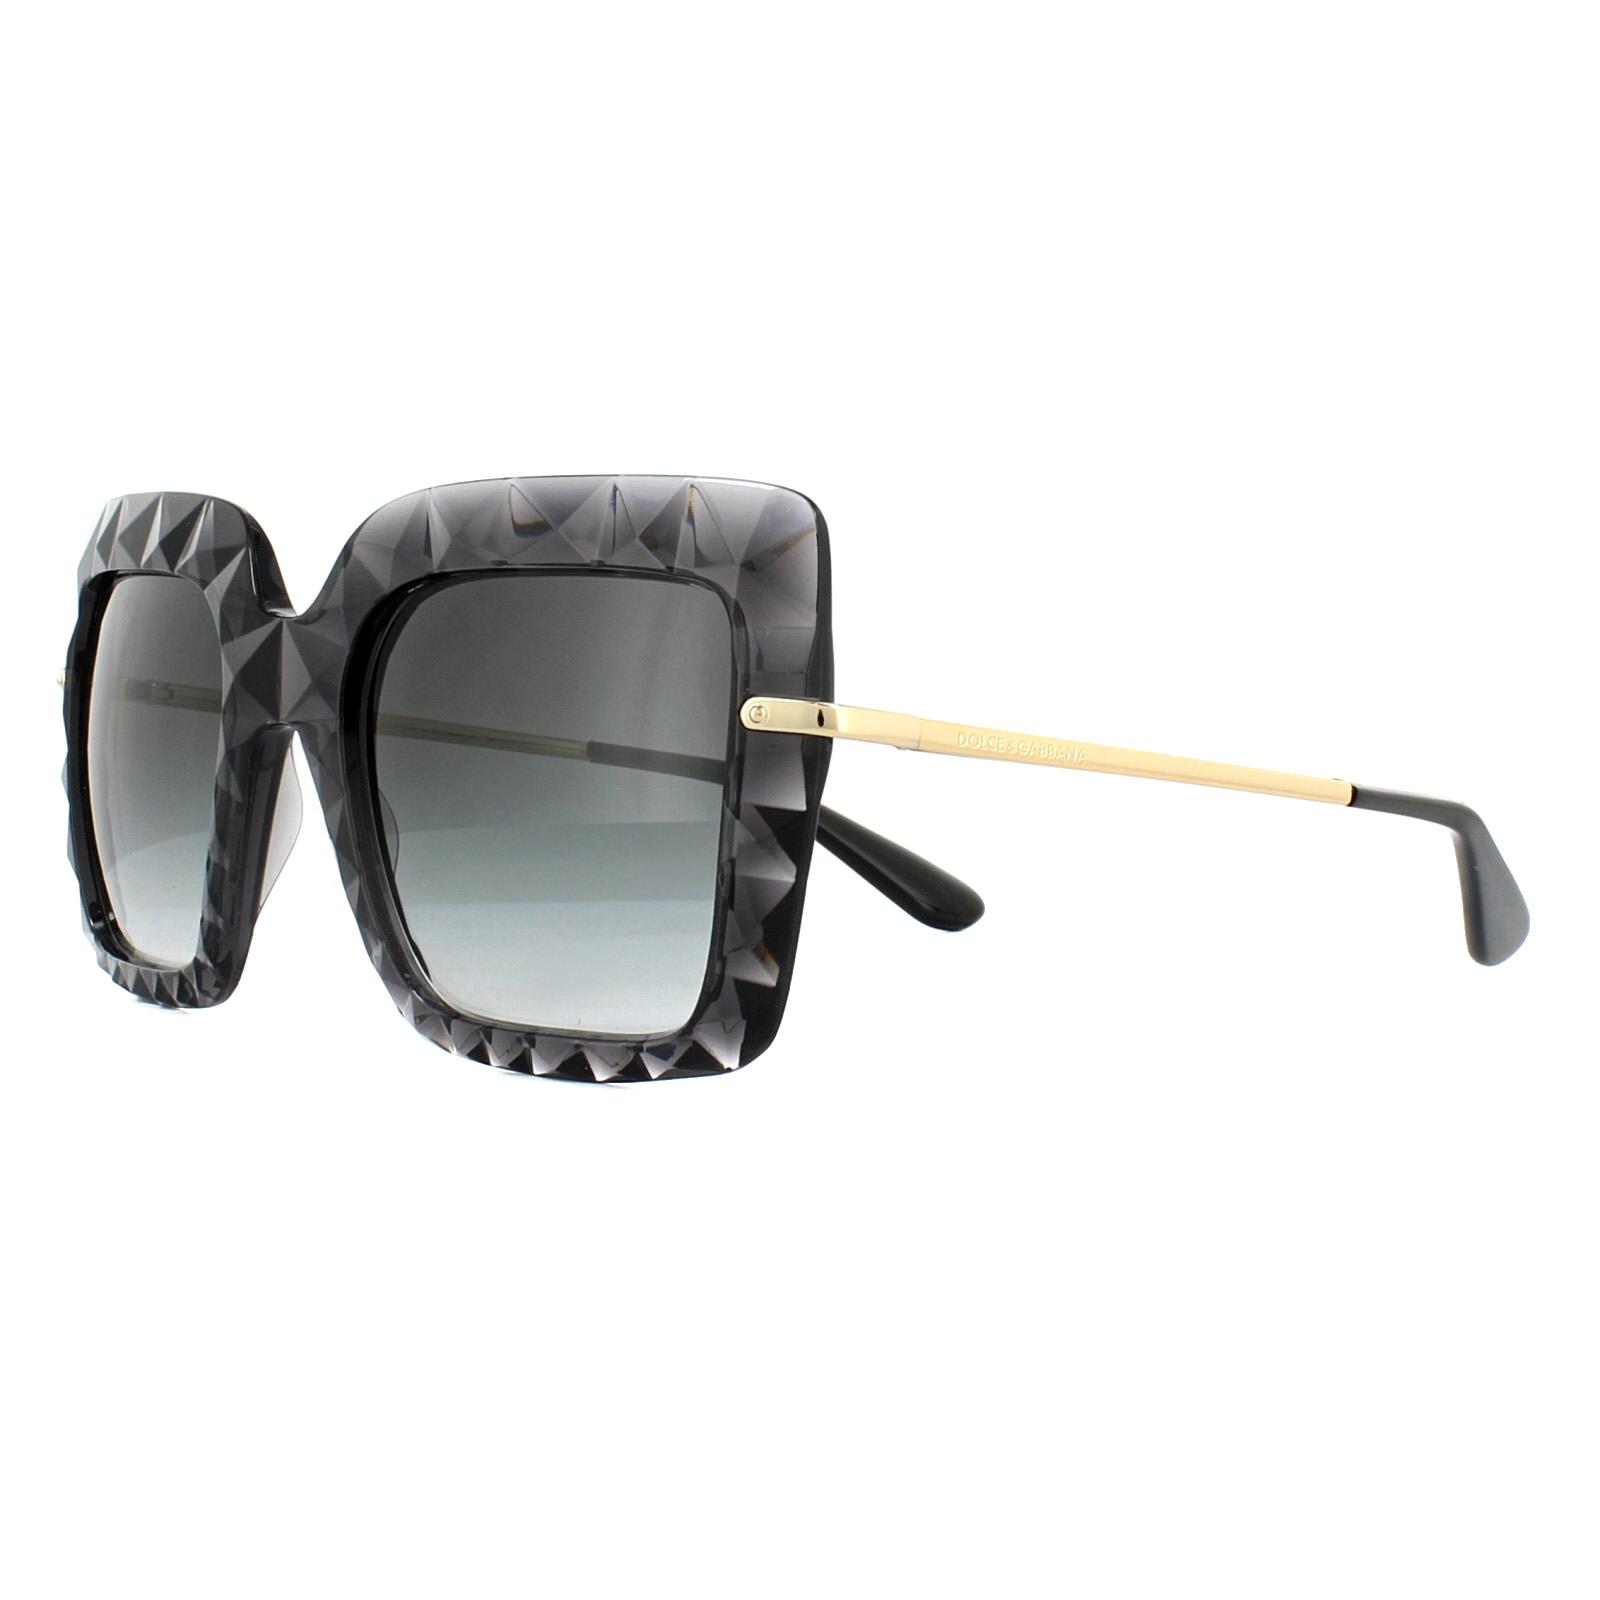 3cd2808e85fd Cheap Dolce   Gabbana DG6111 Sunglasses - Discounted Sunglasses